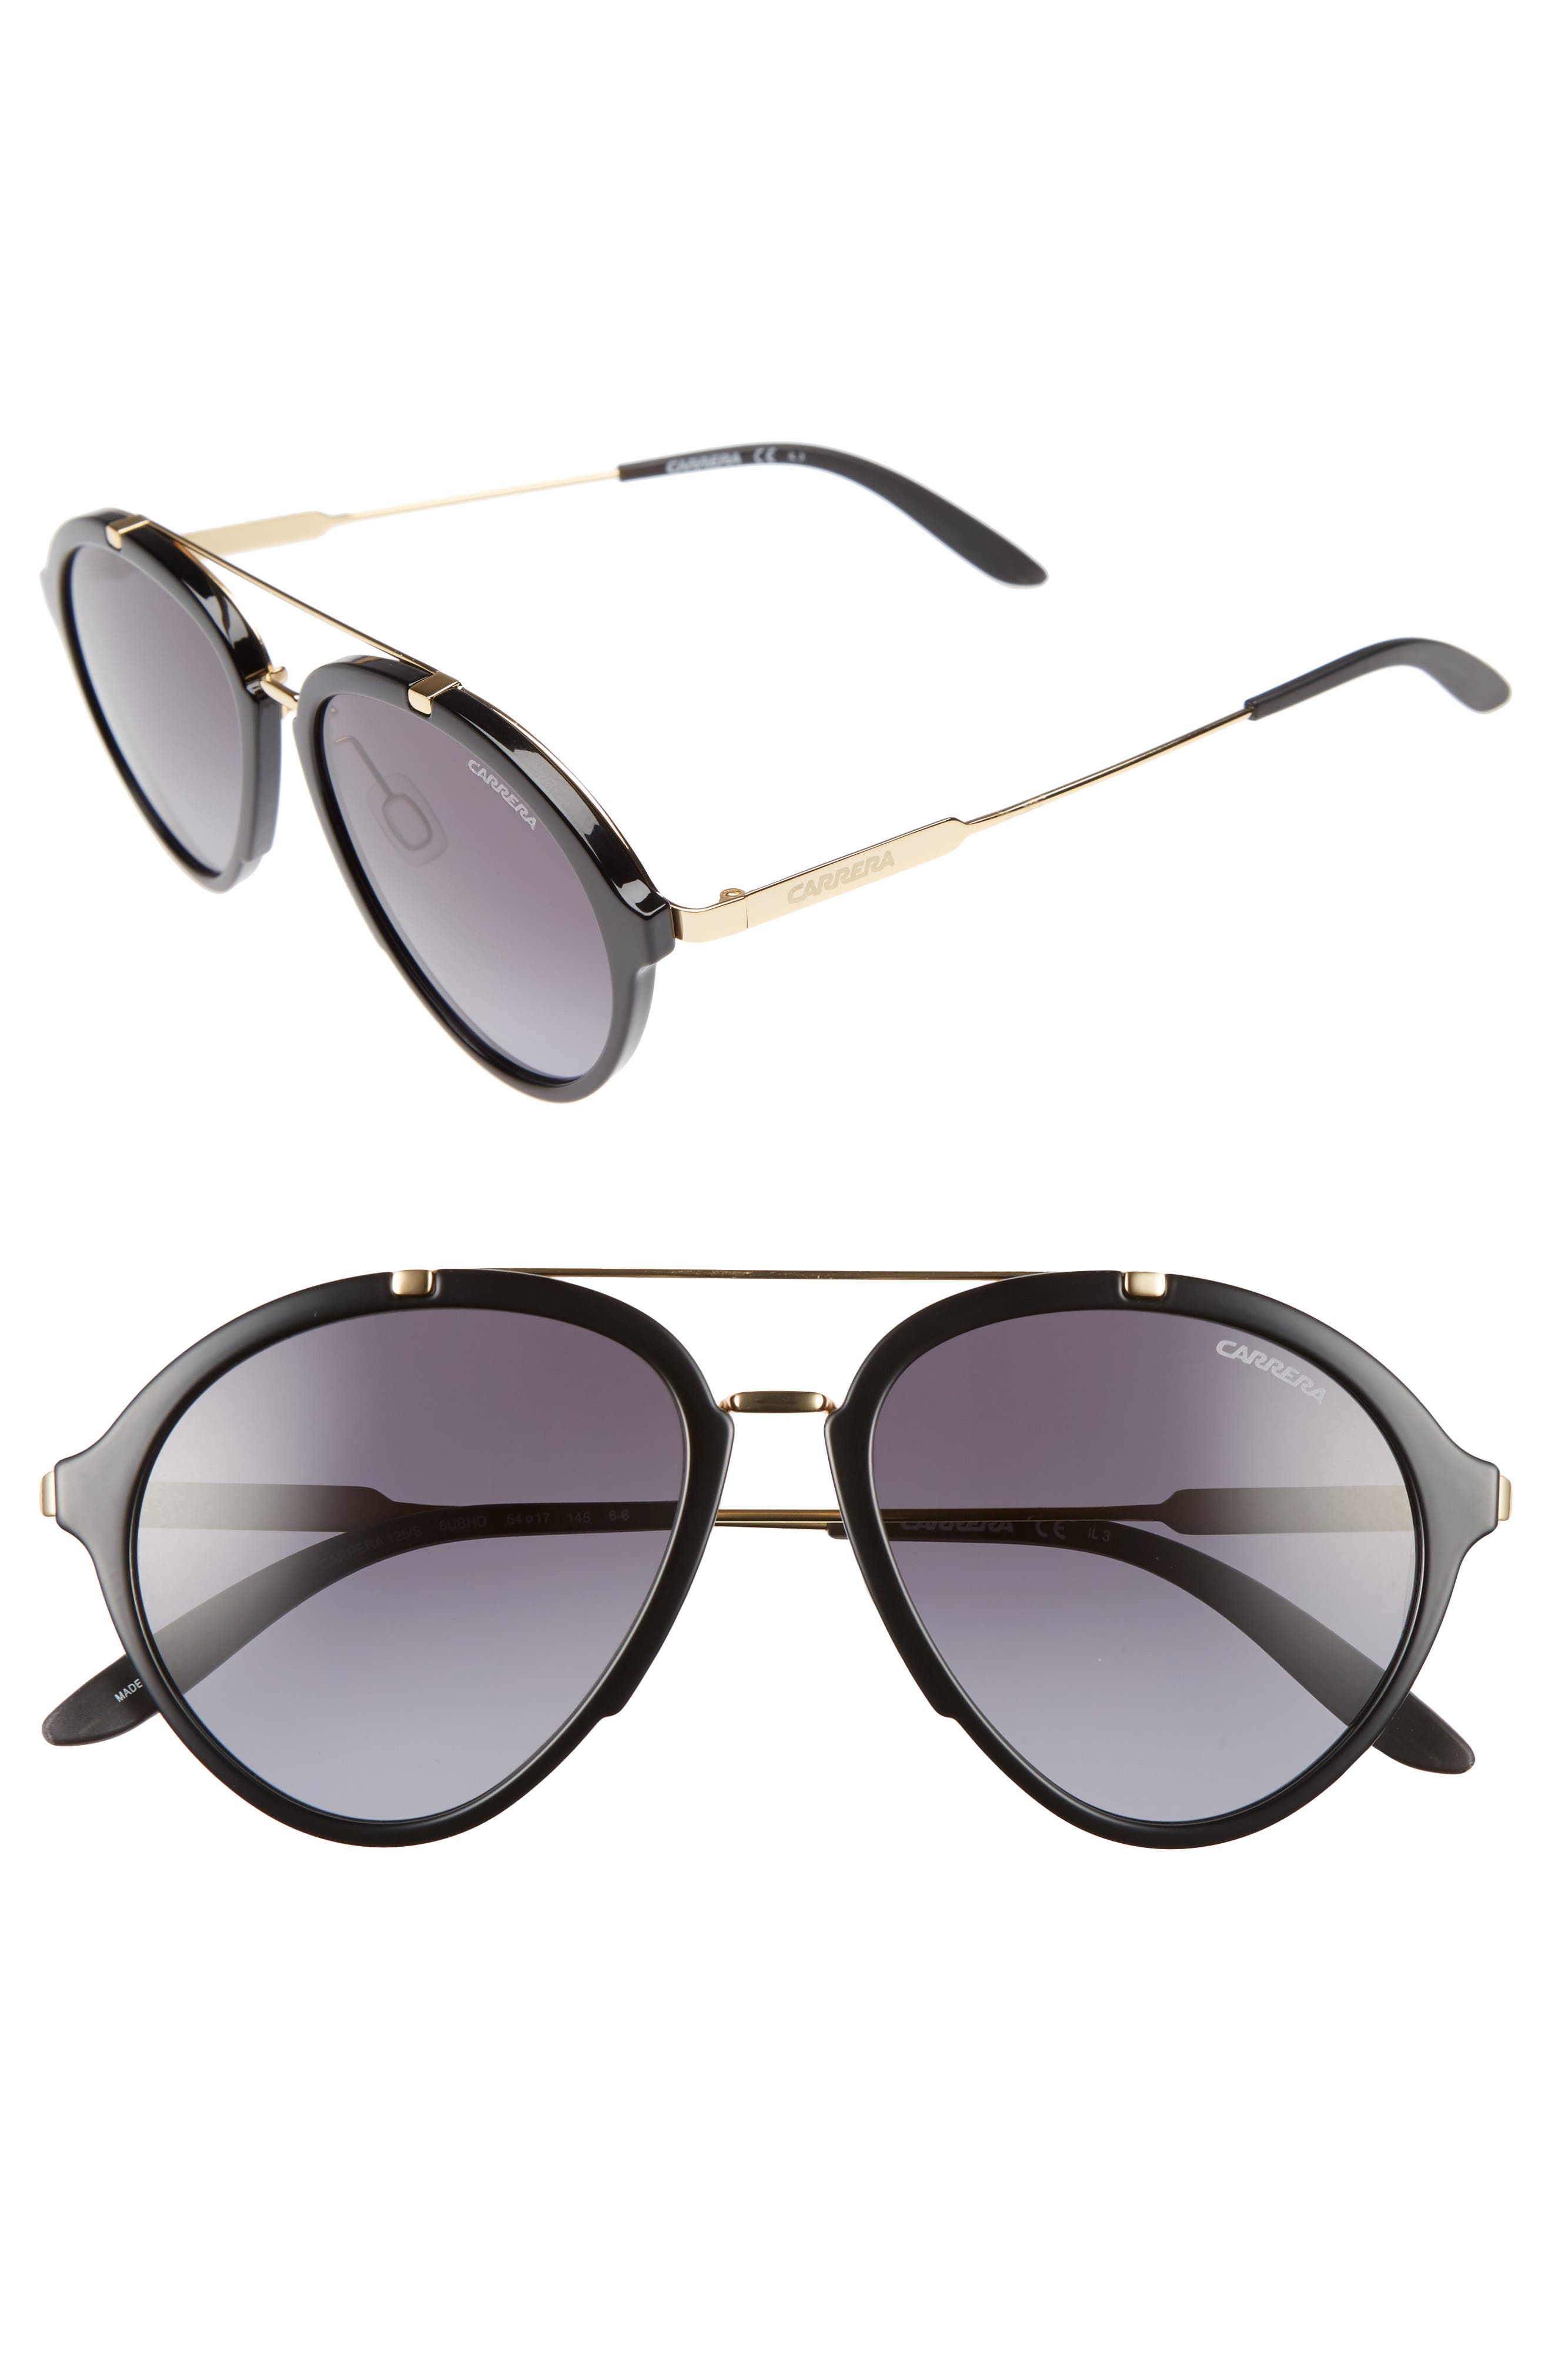 54mm Gradient Aviator Sunglasses,                             Main thumbnail 1, color,                             001